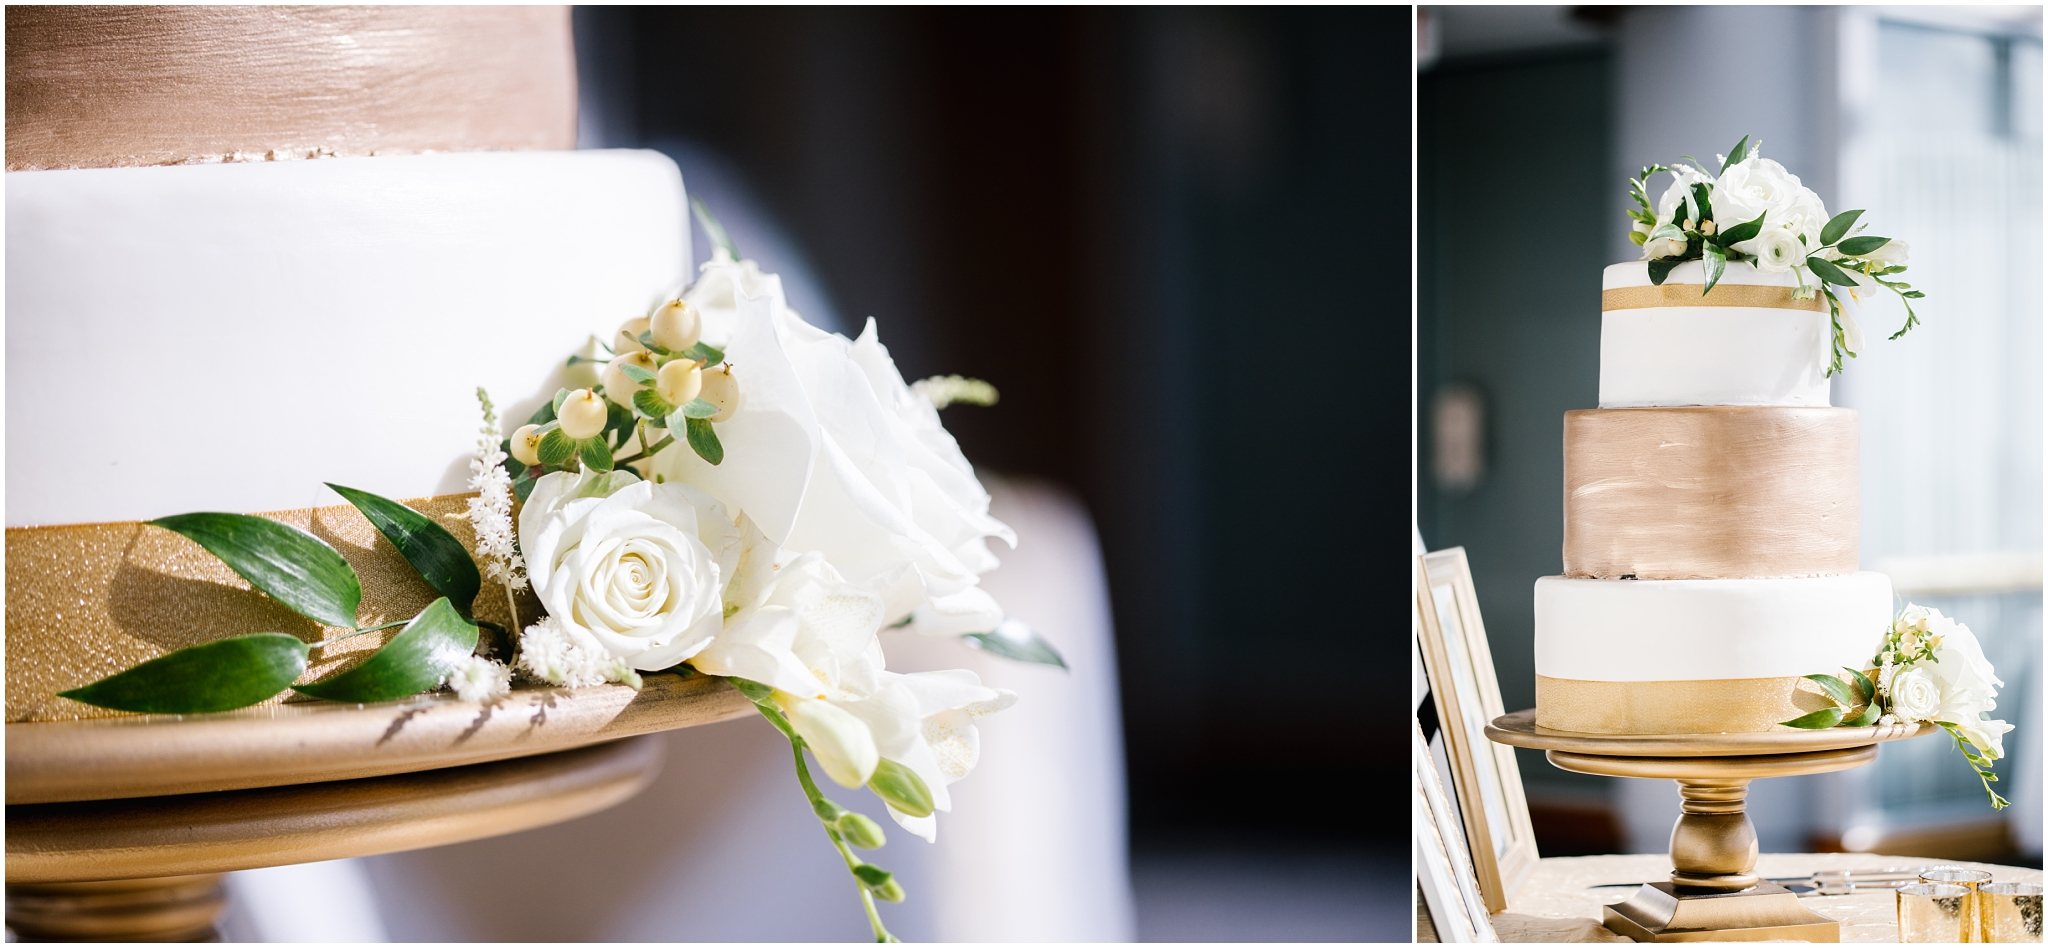 CherylandTyler-334_Lizzie-B-Imagery-Utah-Wedding-Photographer-Salt-Lake-City-Temple-Wells-Fargo-Building-Reception.jpg